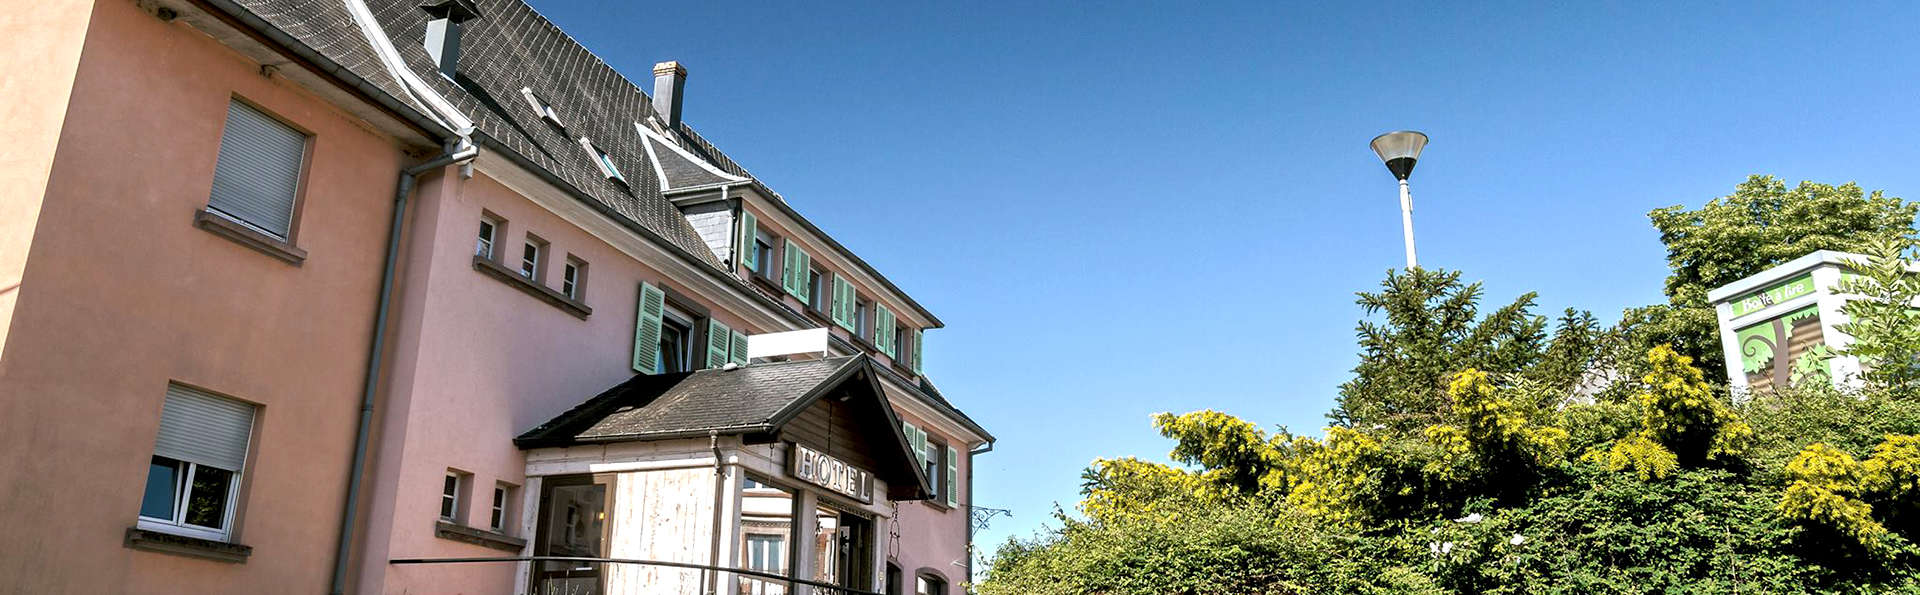 Hôtel Restaurant et Spa Au Tilleul - Edit_Front.jpg